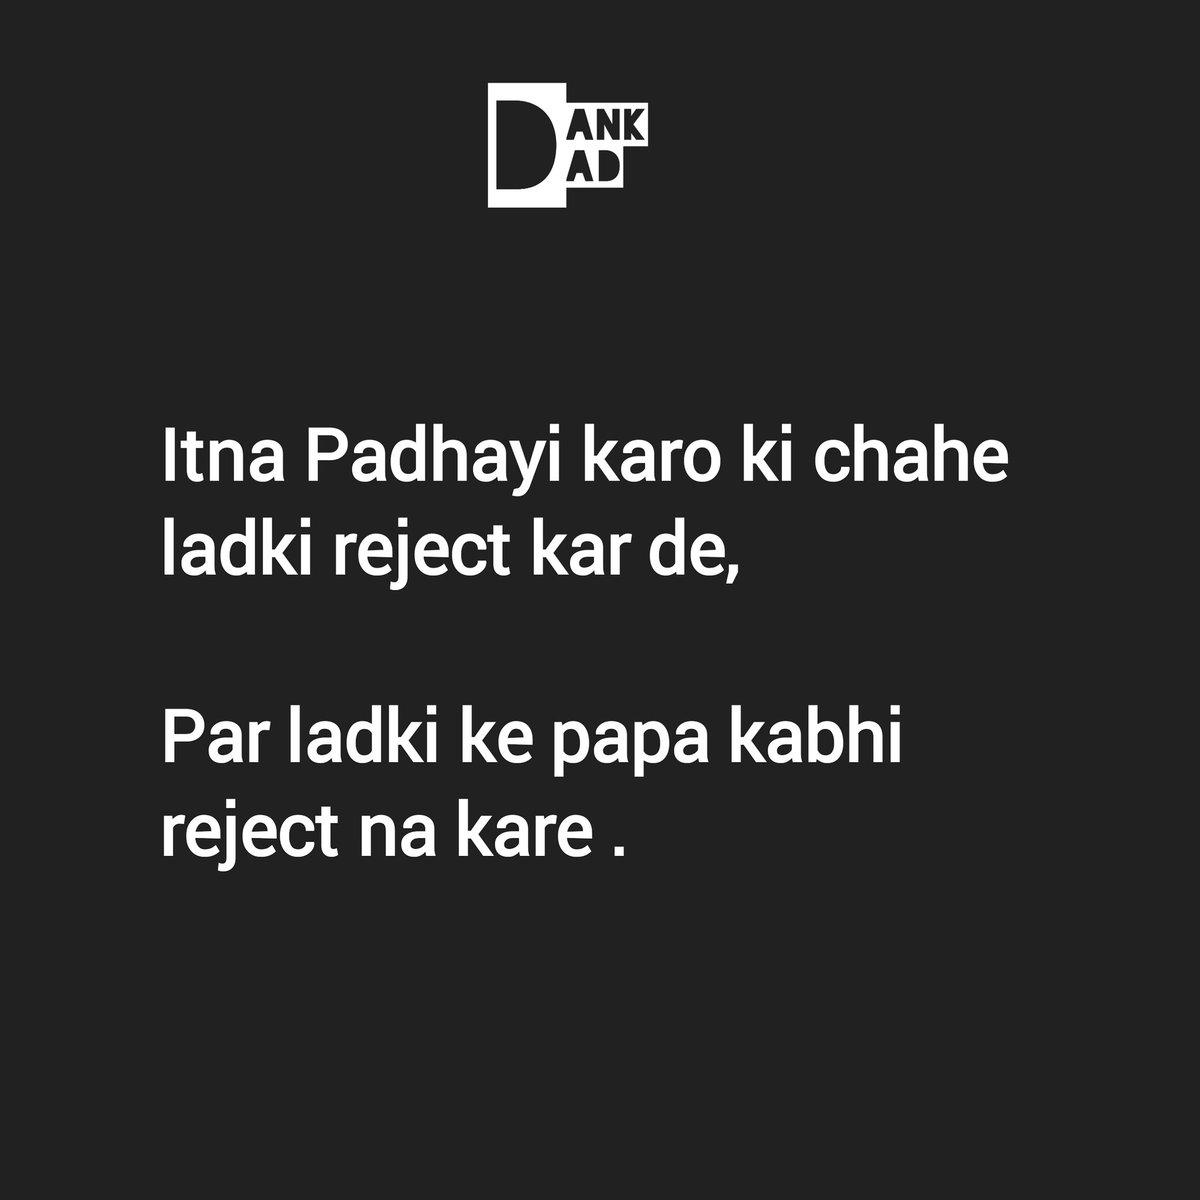 Follow @_dank_dad_ for more ....#fun #jokeoftheday #laugh  #dankjokes #nonvegjokes #follow #funny #jokes #sarcasm #FF #likes #comedyindia #backchodi #sacredmemes #bollywoodpic.twitter.com/ytCmF09VXE